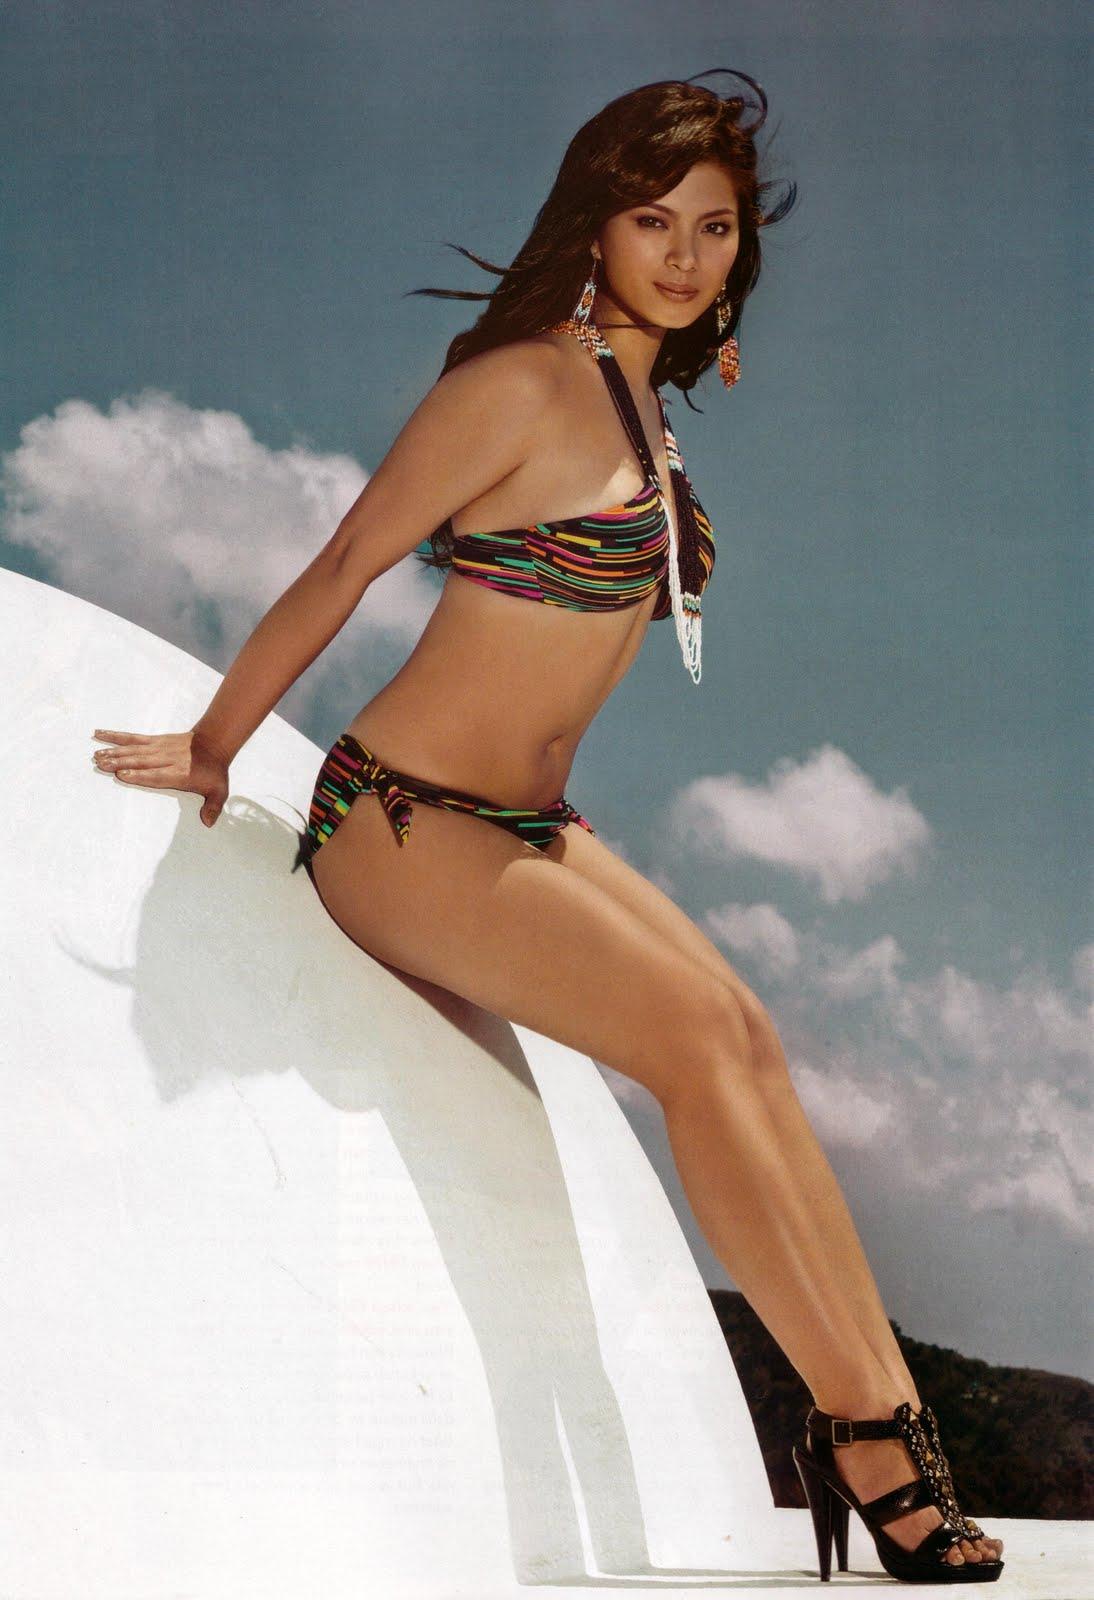 Hot angle Nude Photos 100